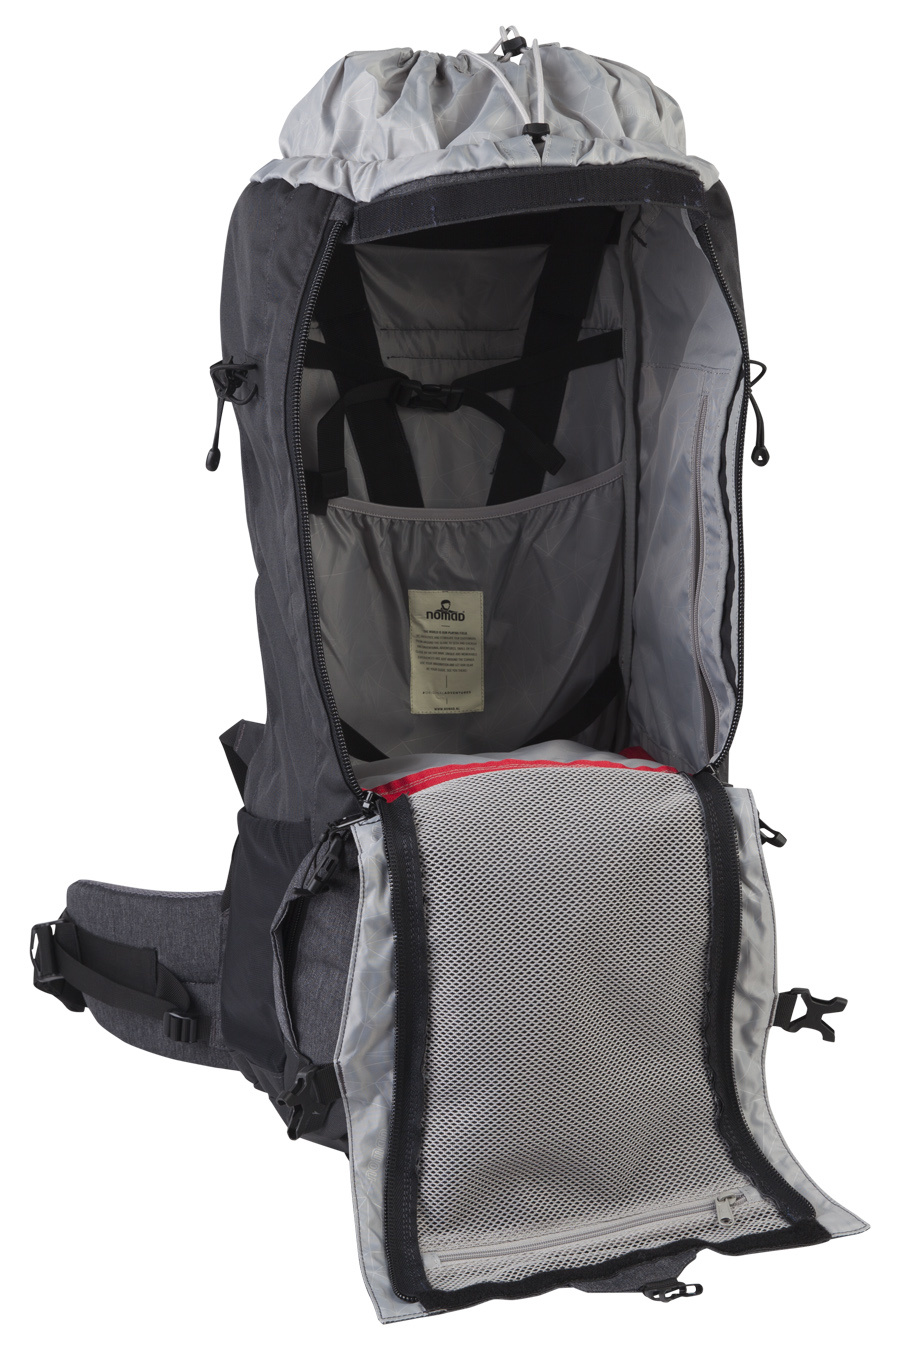 6b4355ccda7 Nomad Karoo 70l backpack heren - Verde | Backpackspullen.nl